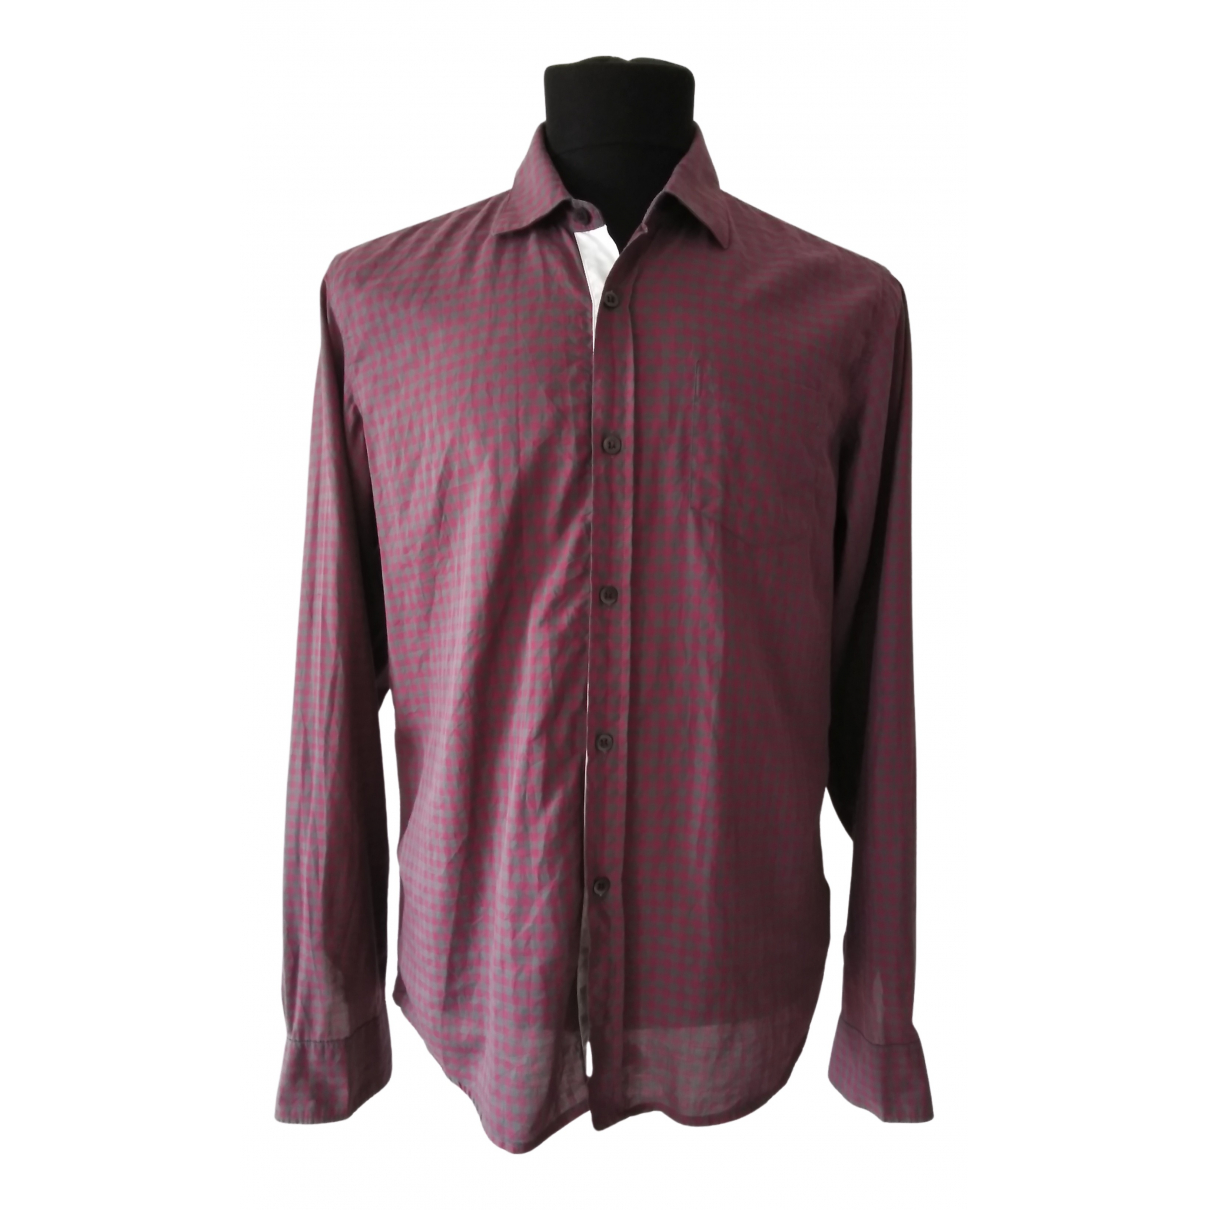 Dries Van Noten N Red Cotton Shirts for Men M International